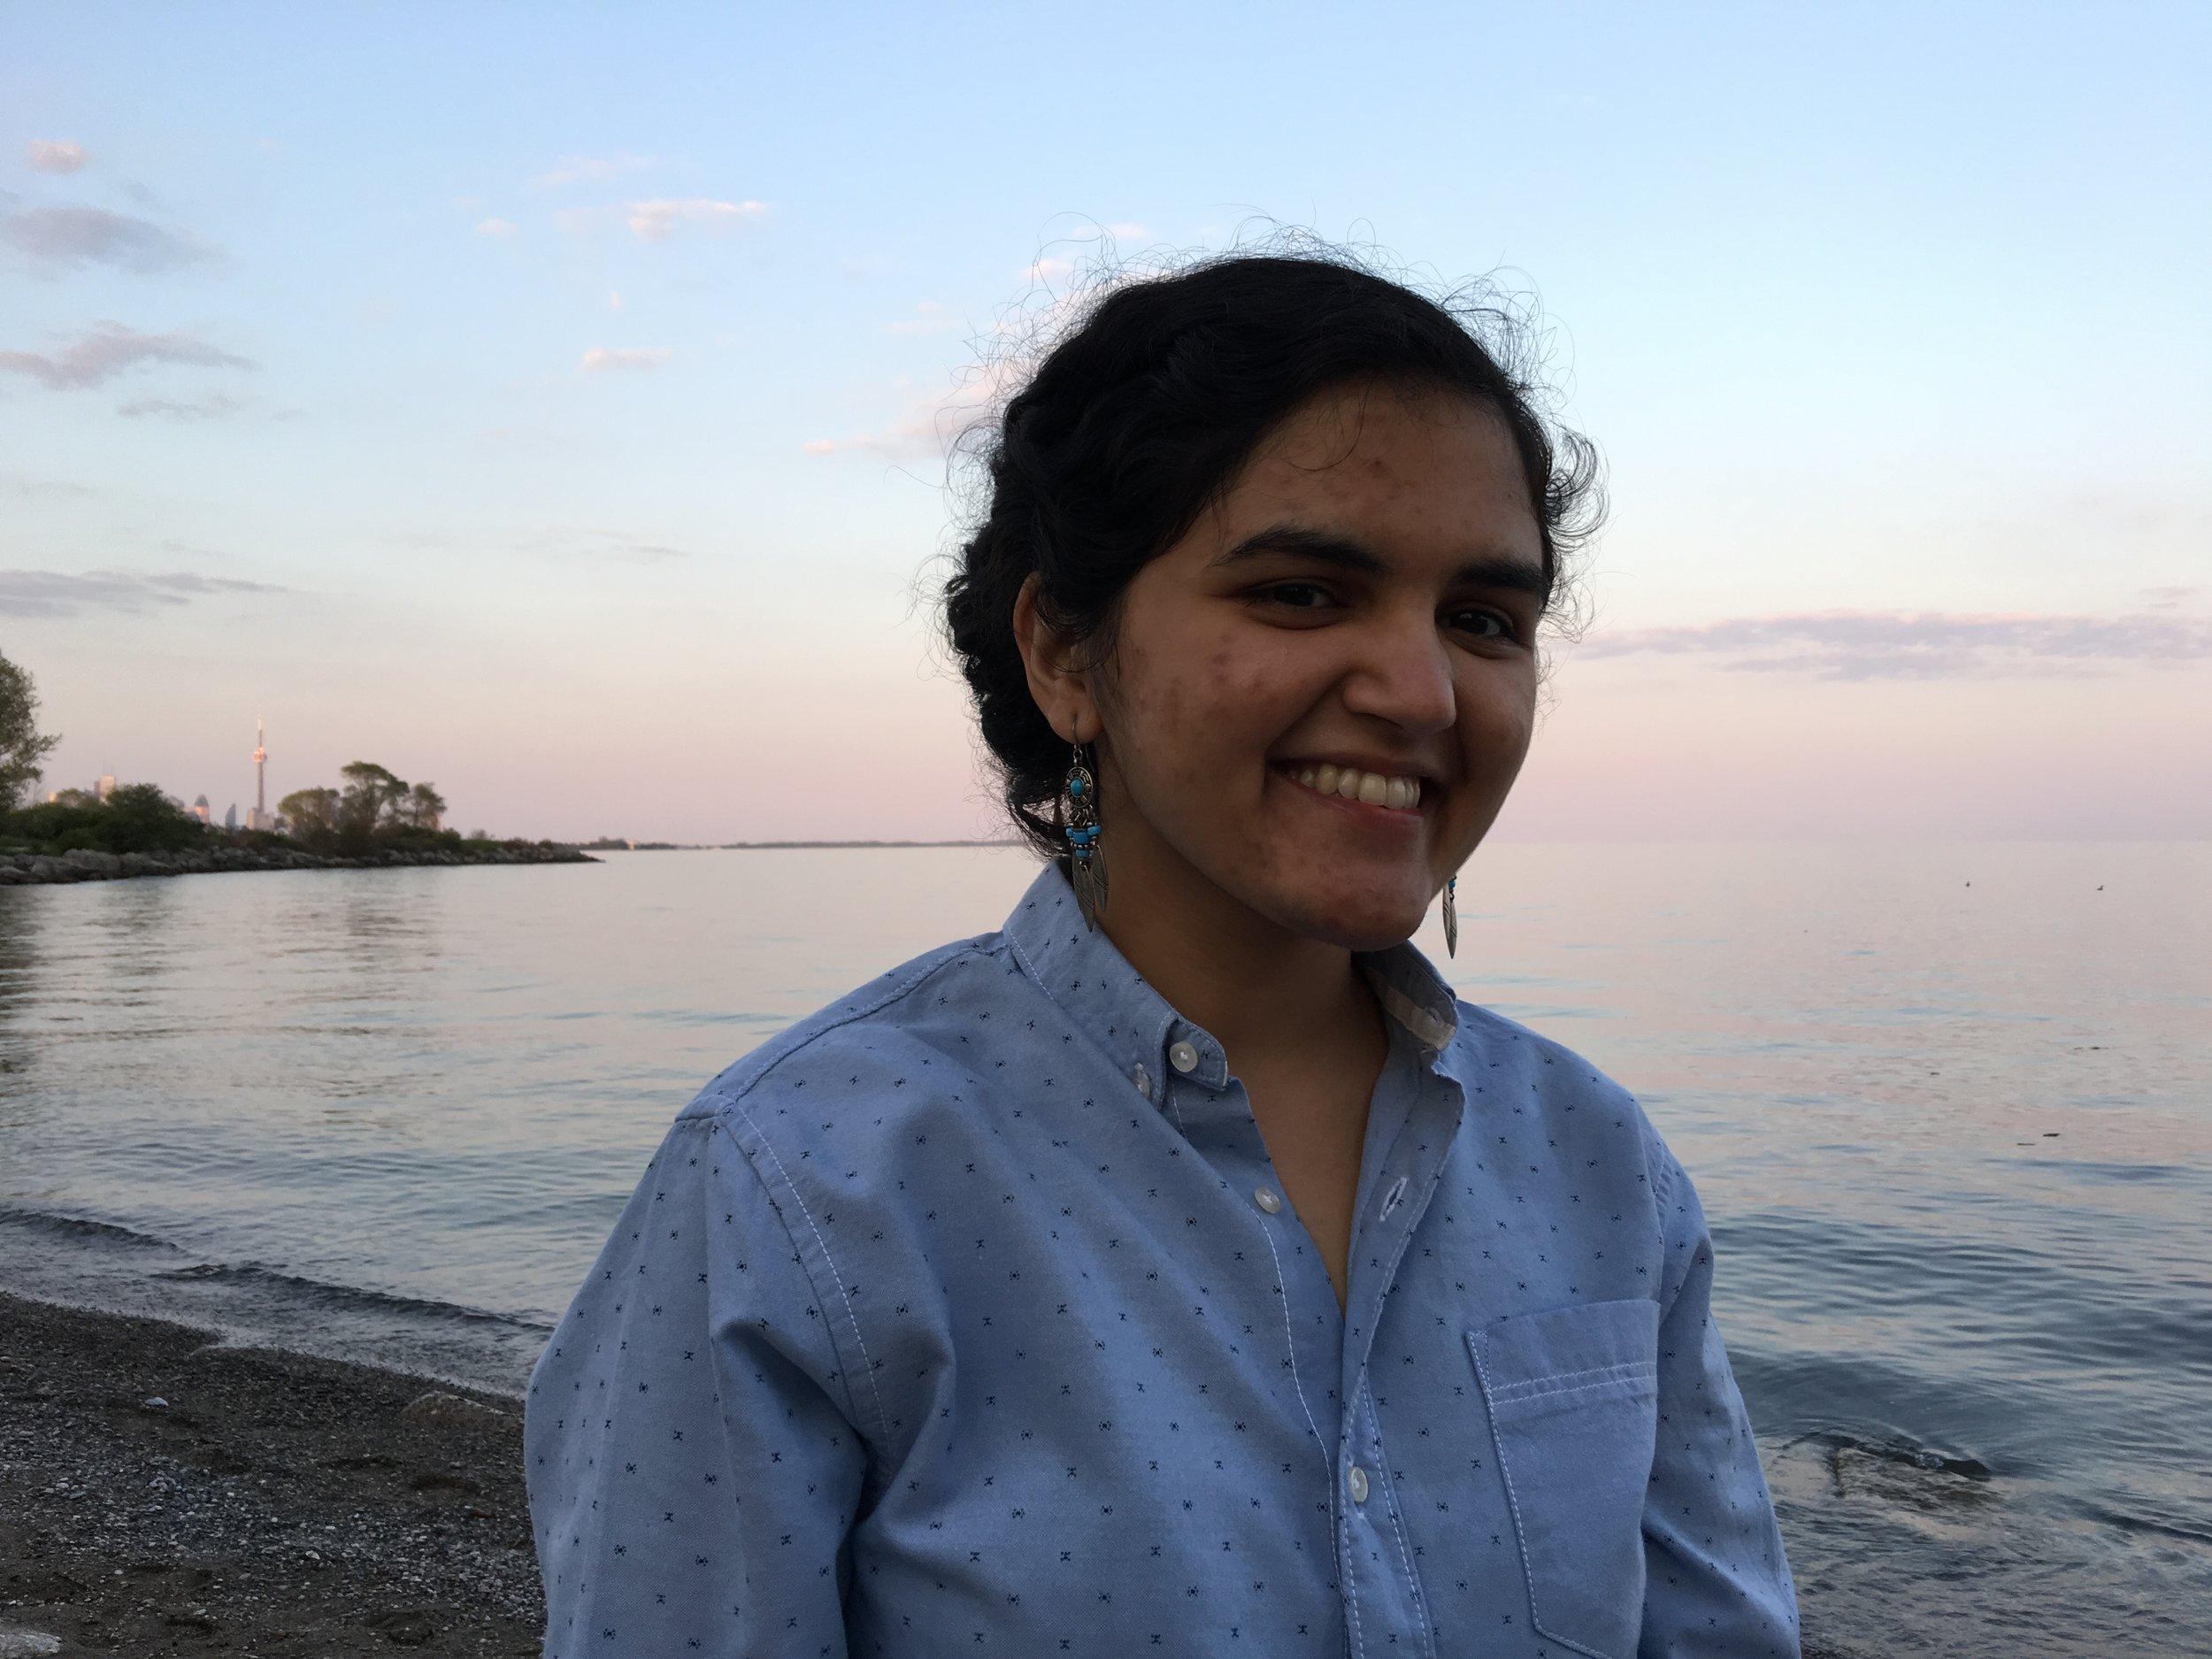 Photo of  Sanjana Bijlani  by Sunil Bijlani.